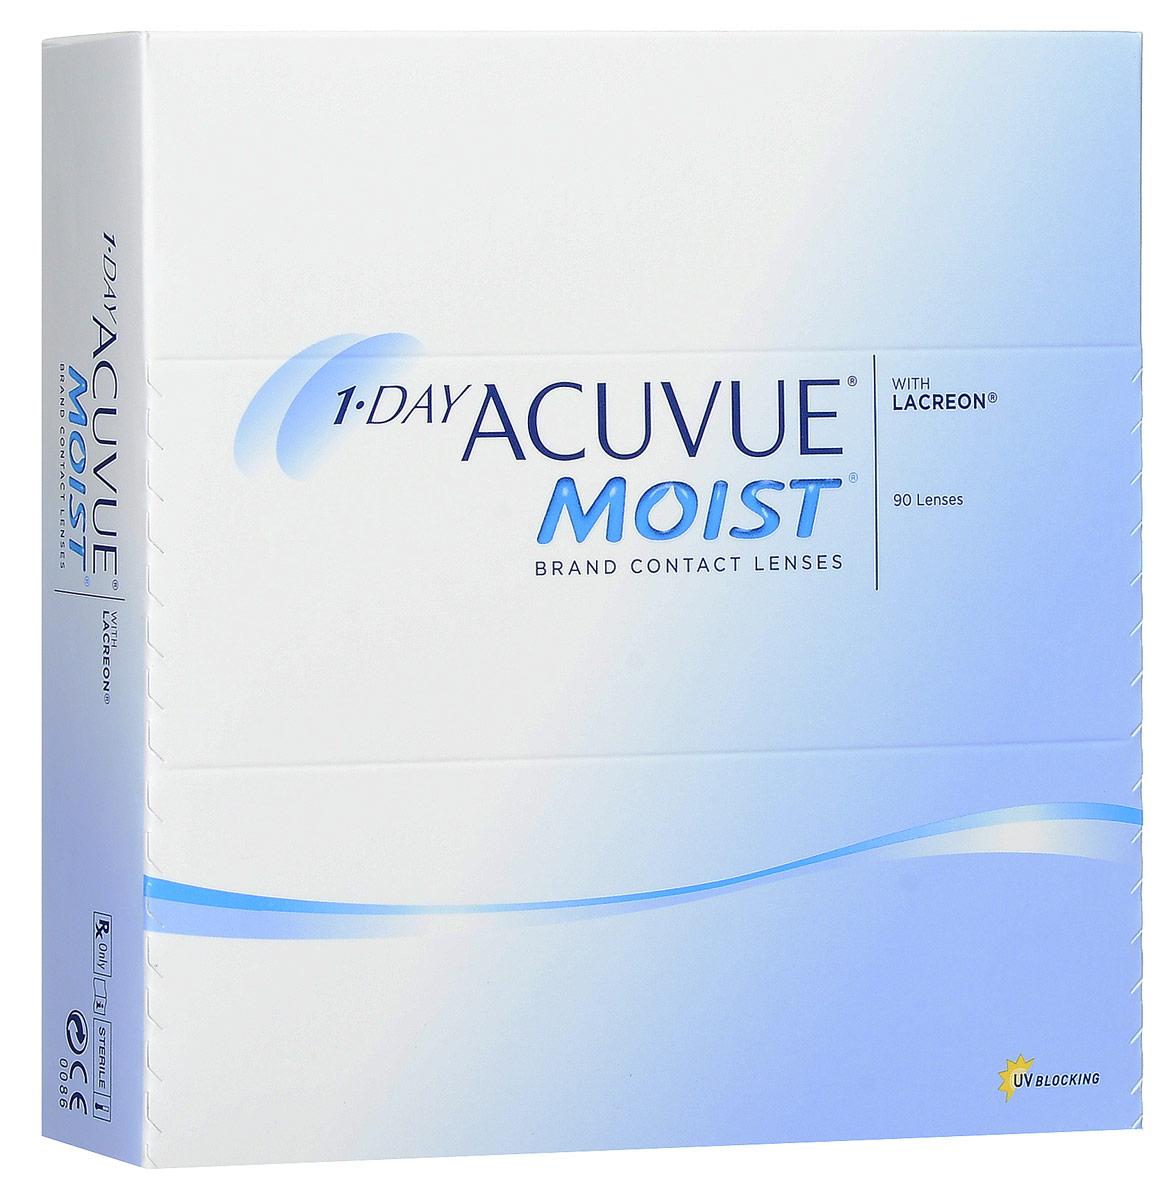 Johnson & Johnson контактные линзы Acuvue 1-DAY Acuvue Moist (90pk / 9.0 / - 6.50)